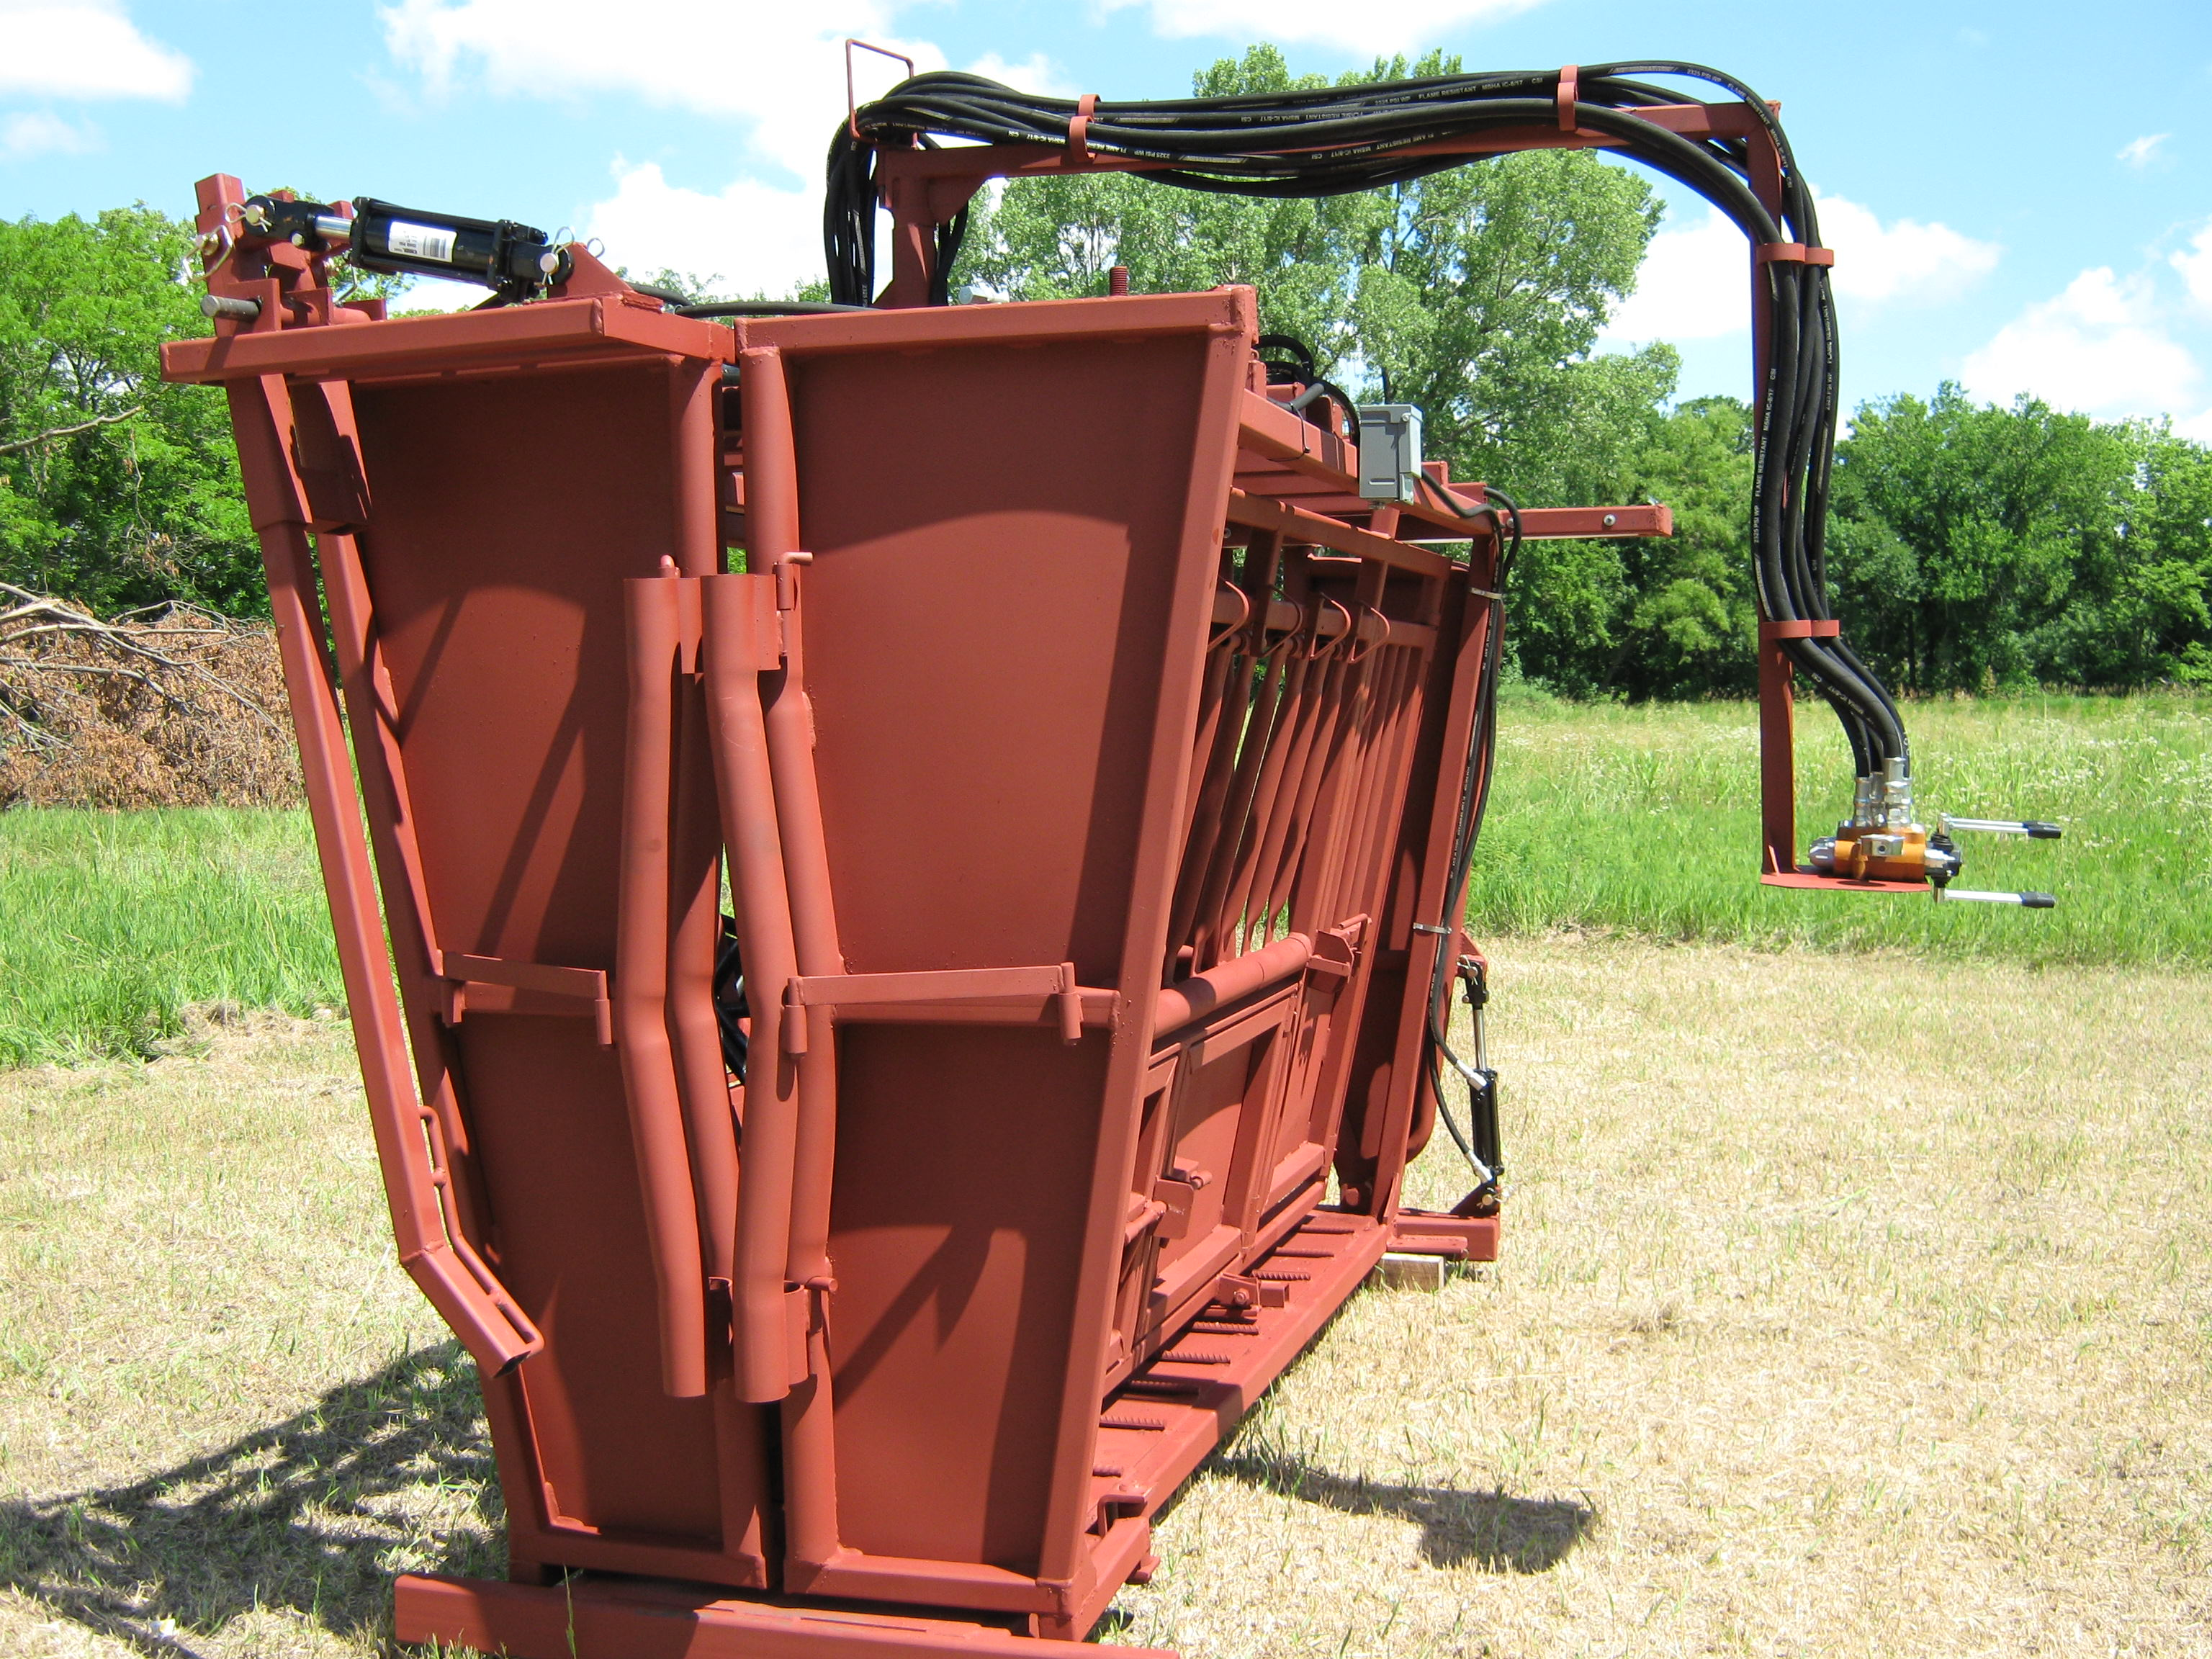 ... Preg Doors ... & TaskMaster Custom Hydraulic Chute | Luco Manufacturing